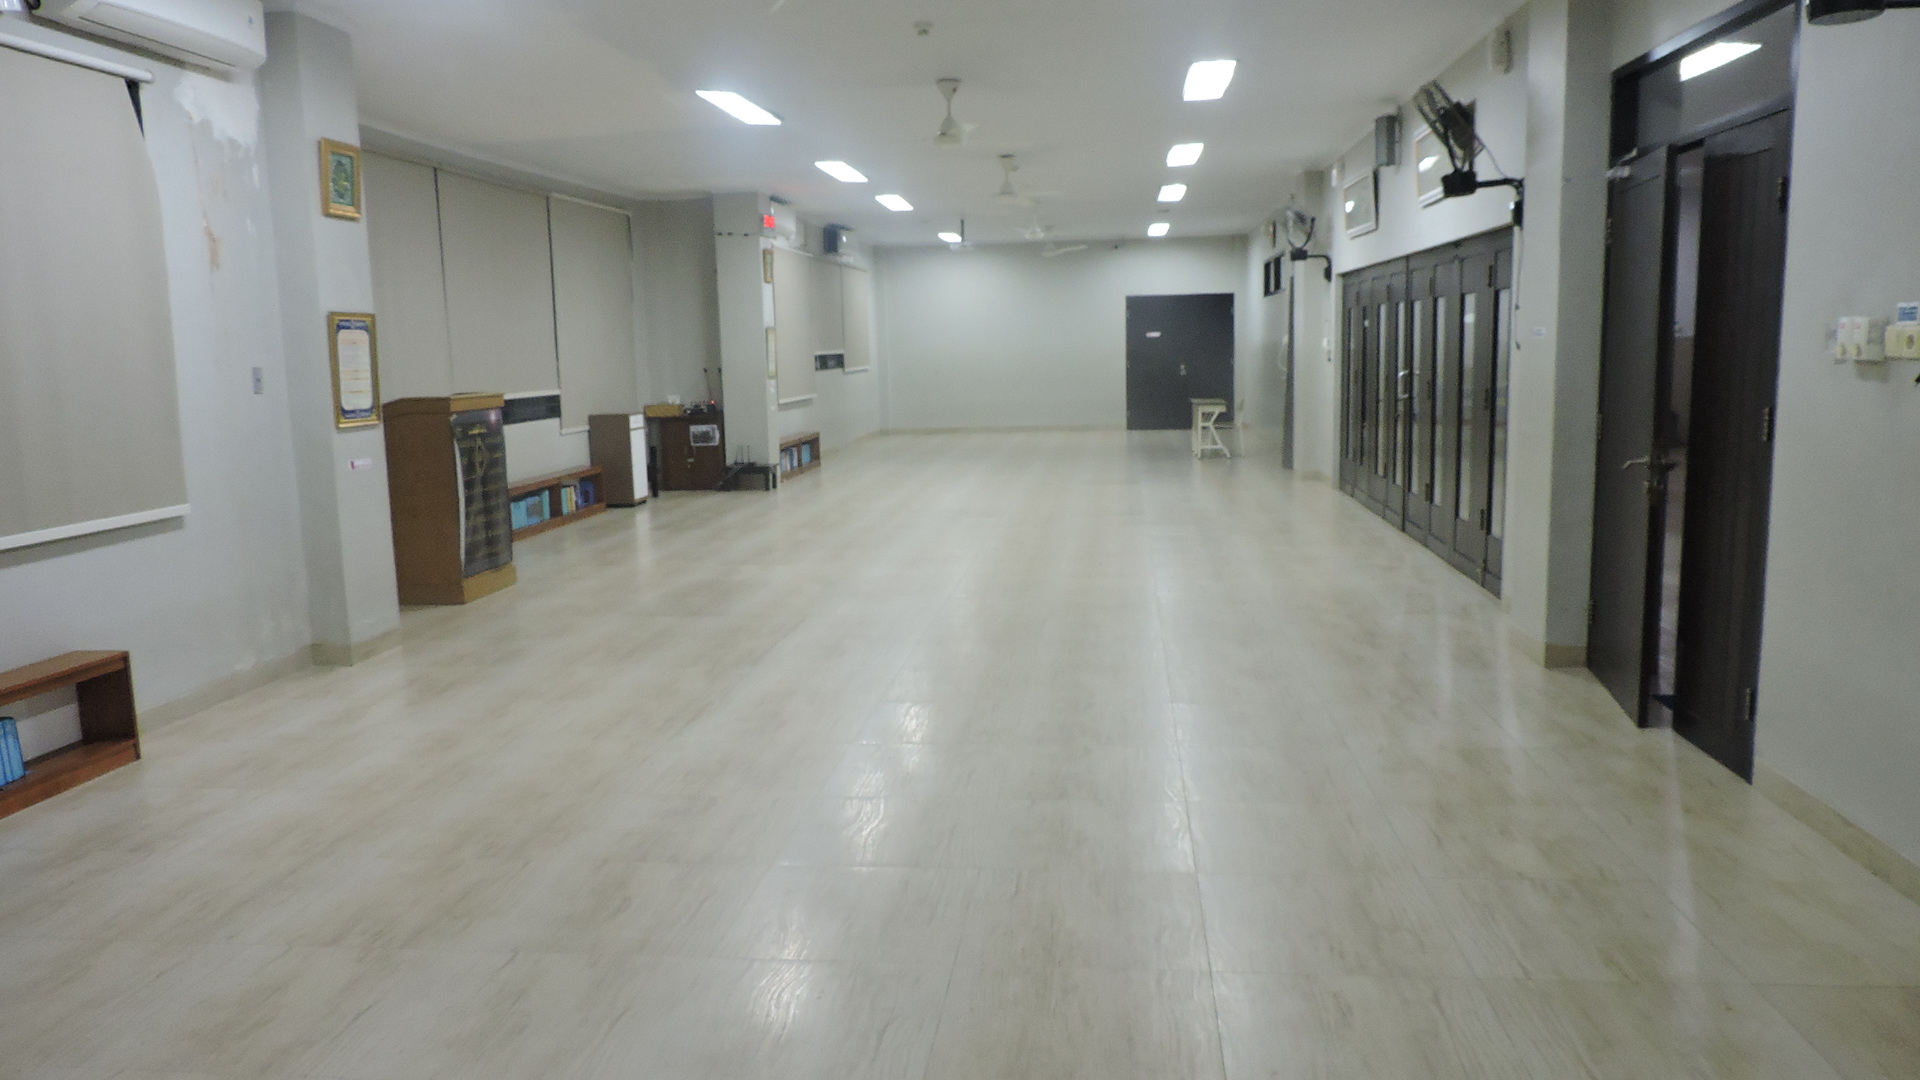 Ruang Ibadah / Hall